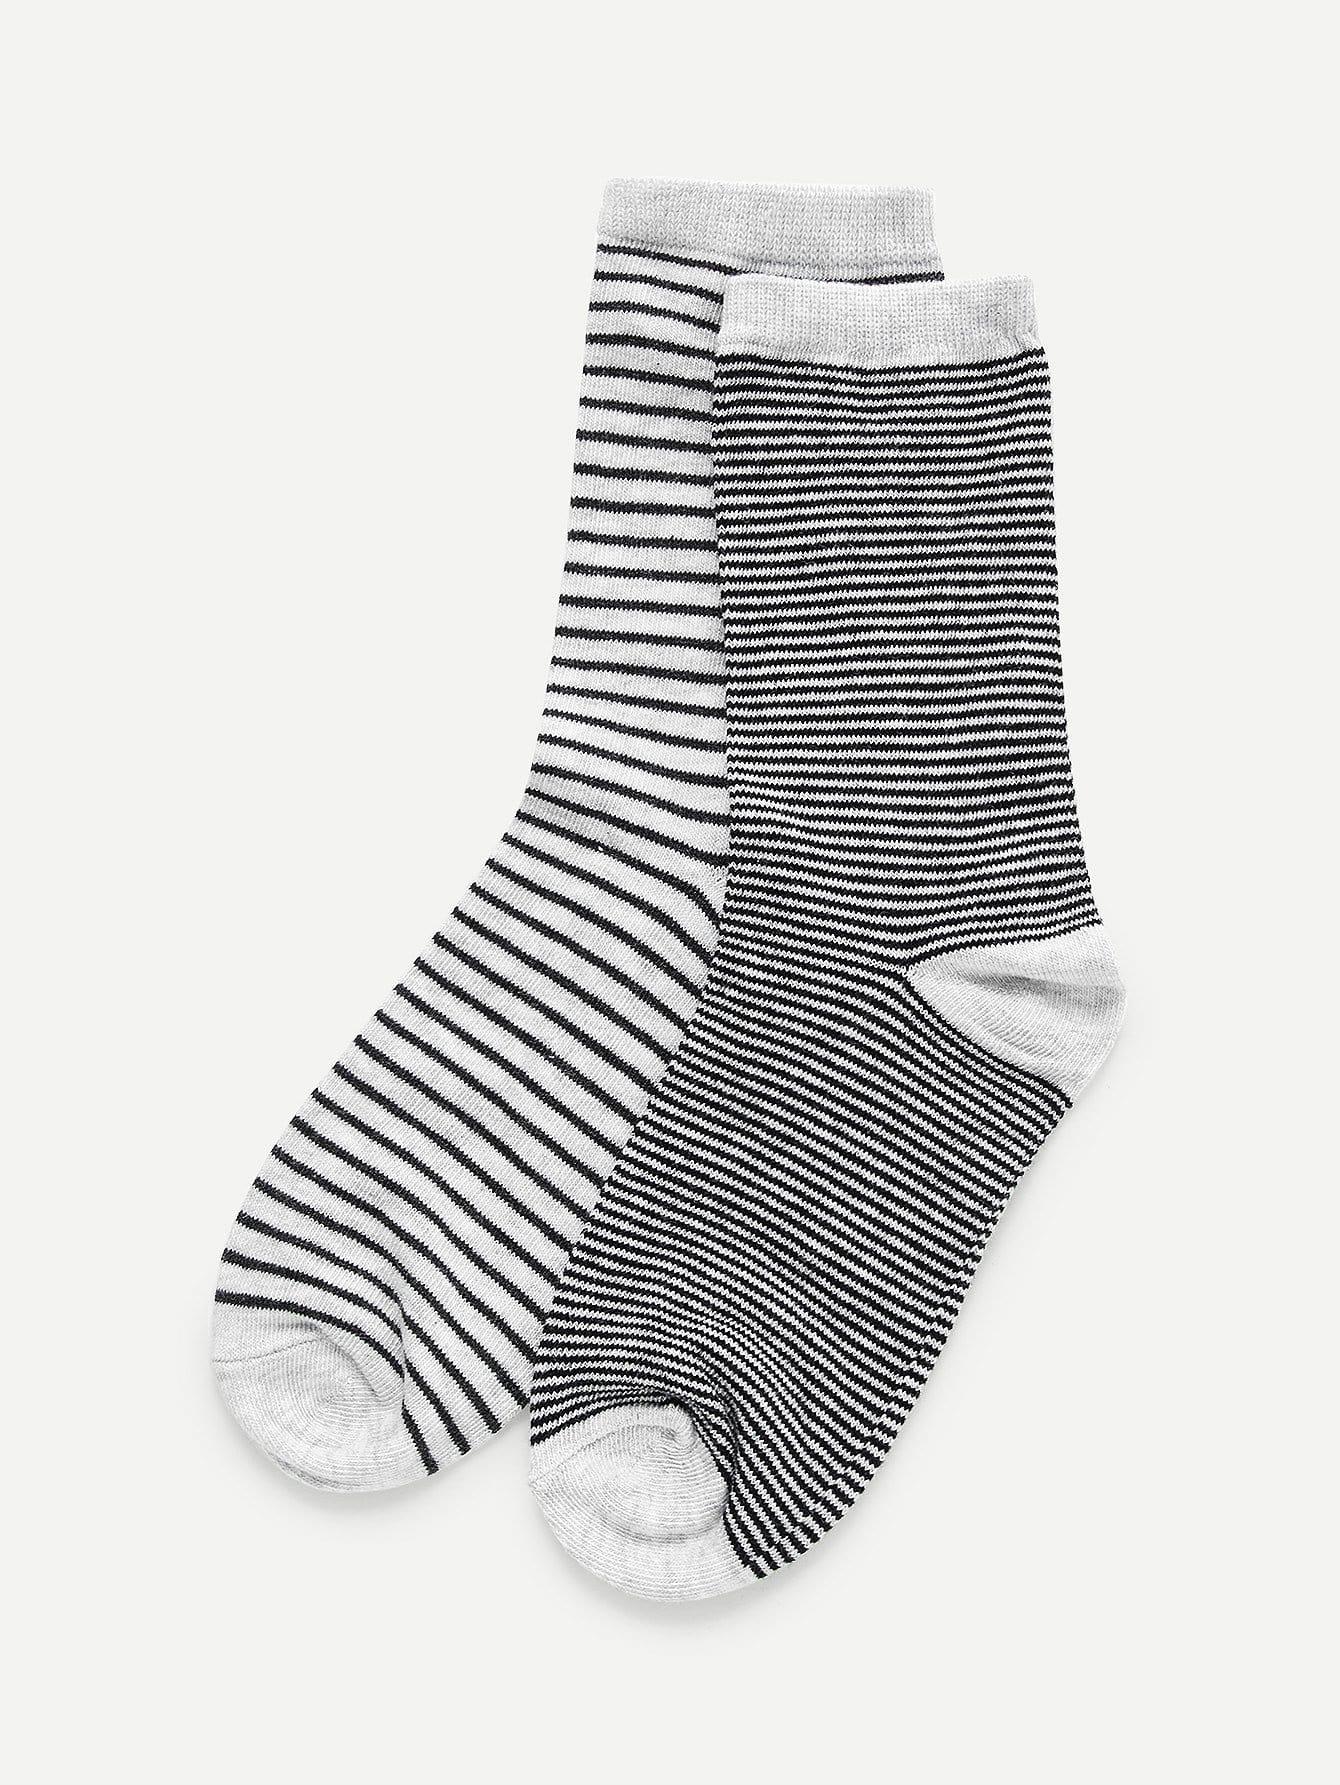 Striped Calf Length Socks 2pairs ombre circle calf length socks